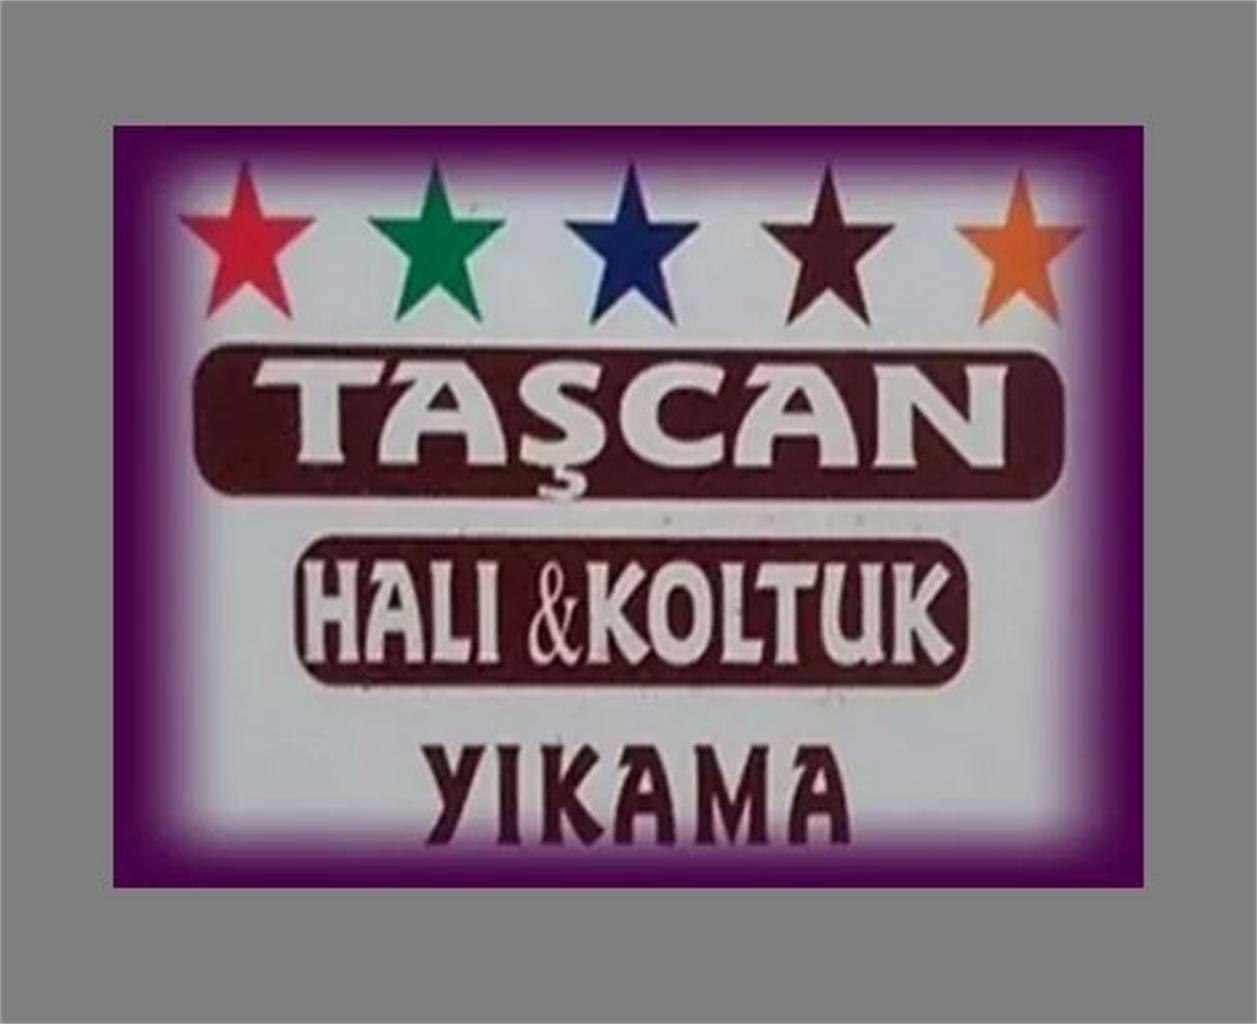 Tascan Hali